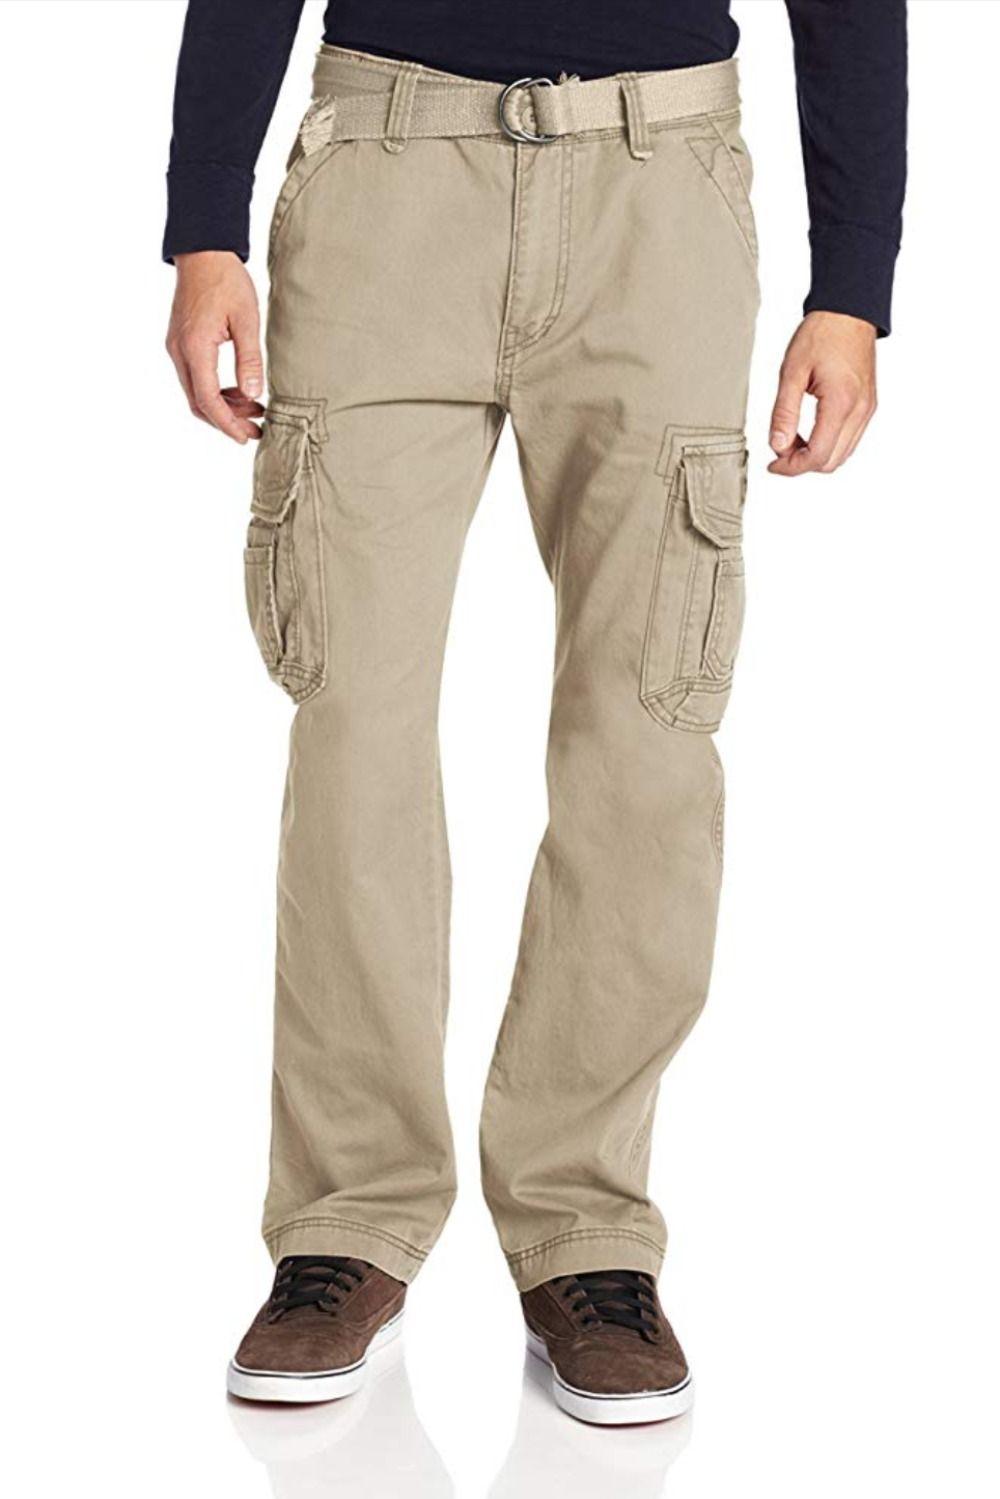 Mens Designer Cargo Combat Jeans Straight Leg Denim Casual Pants Big /& Tall Size